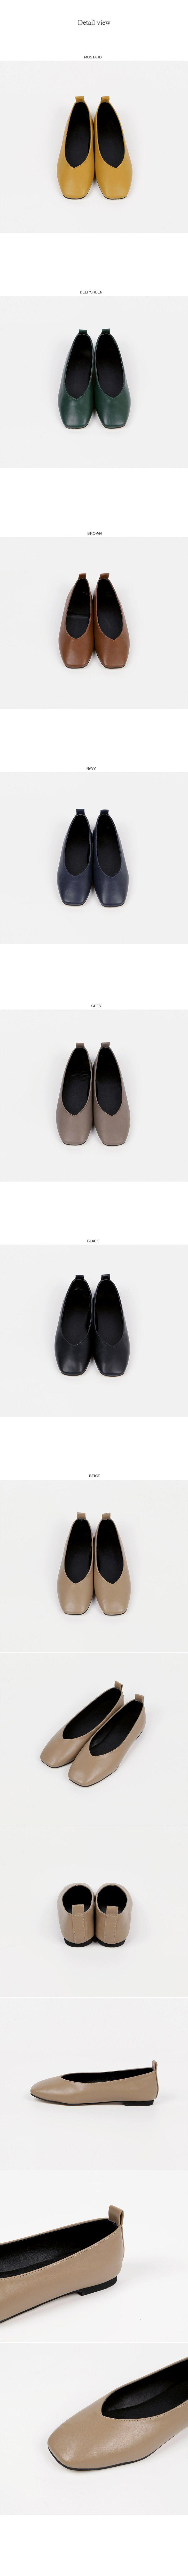 Monchaではレディースファッションの最新トレンドアイテムをオンラインでご購入いただけます。海外の人気ファッションサイトブランドアイテムを公式に取扱う通販サイトです。